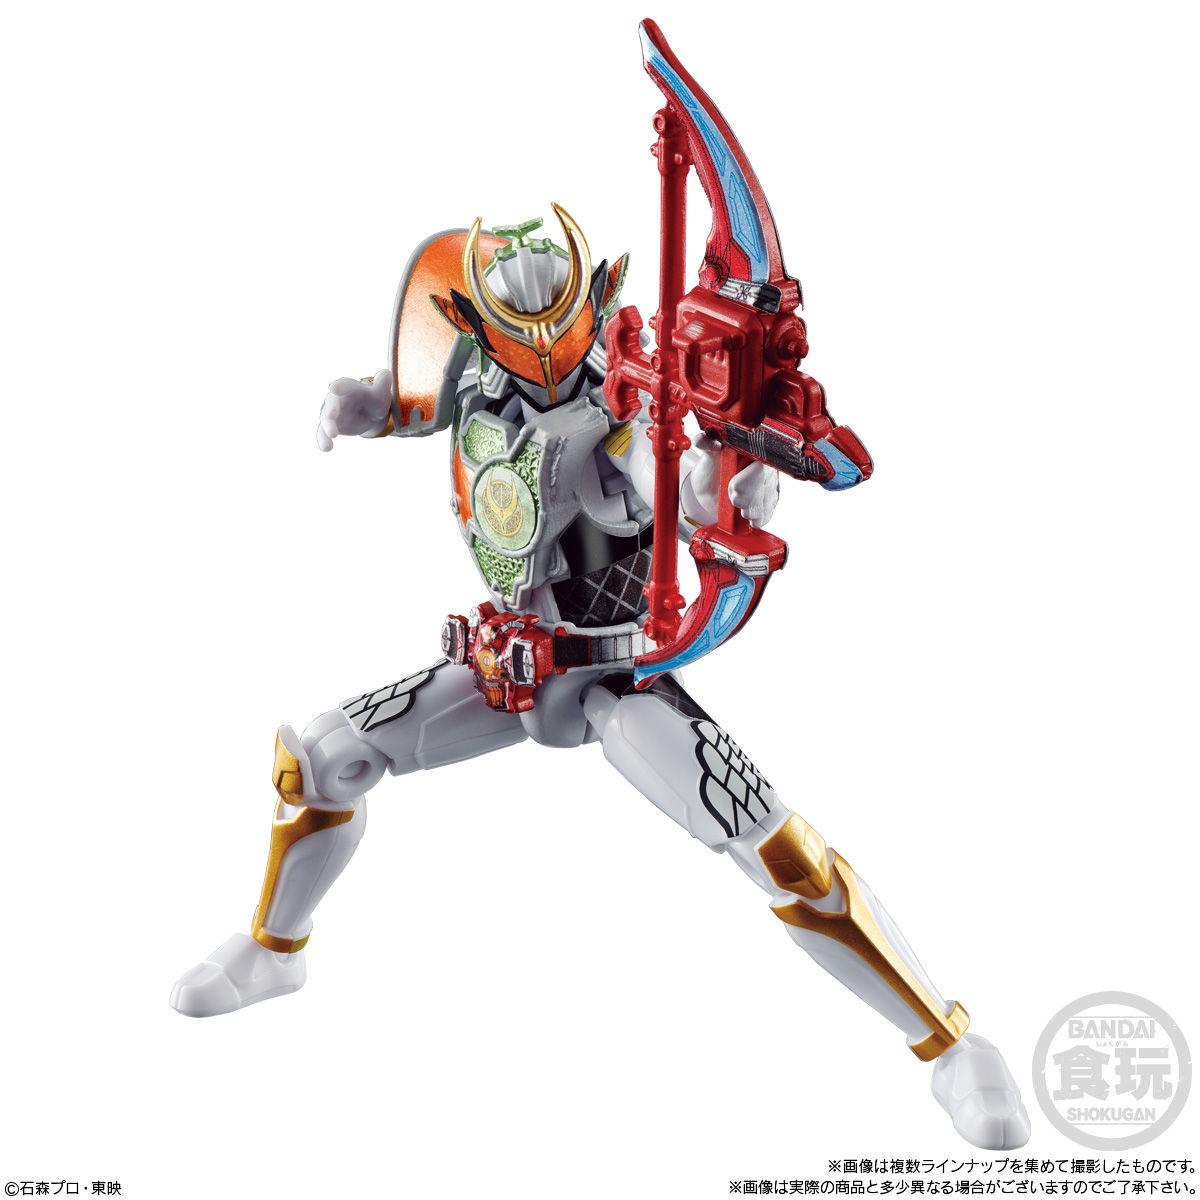 SO-DO CHRONICLE 仮面ライダー鎧武 ゲネシスライダーセット【プレミアムバンダイ限定】_7